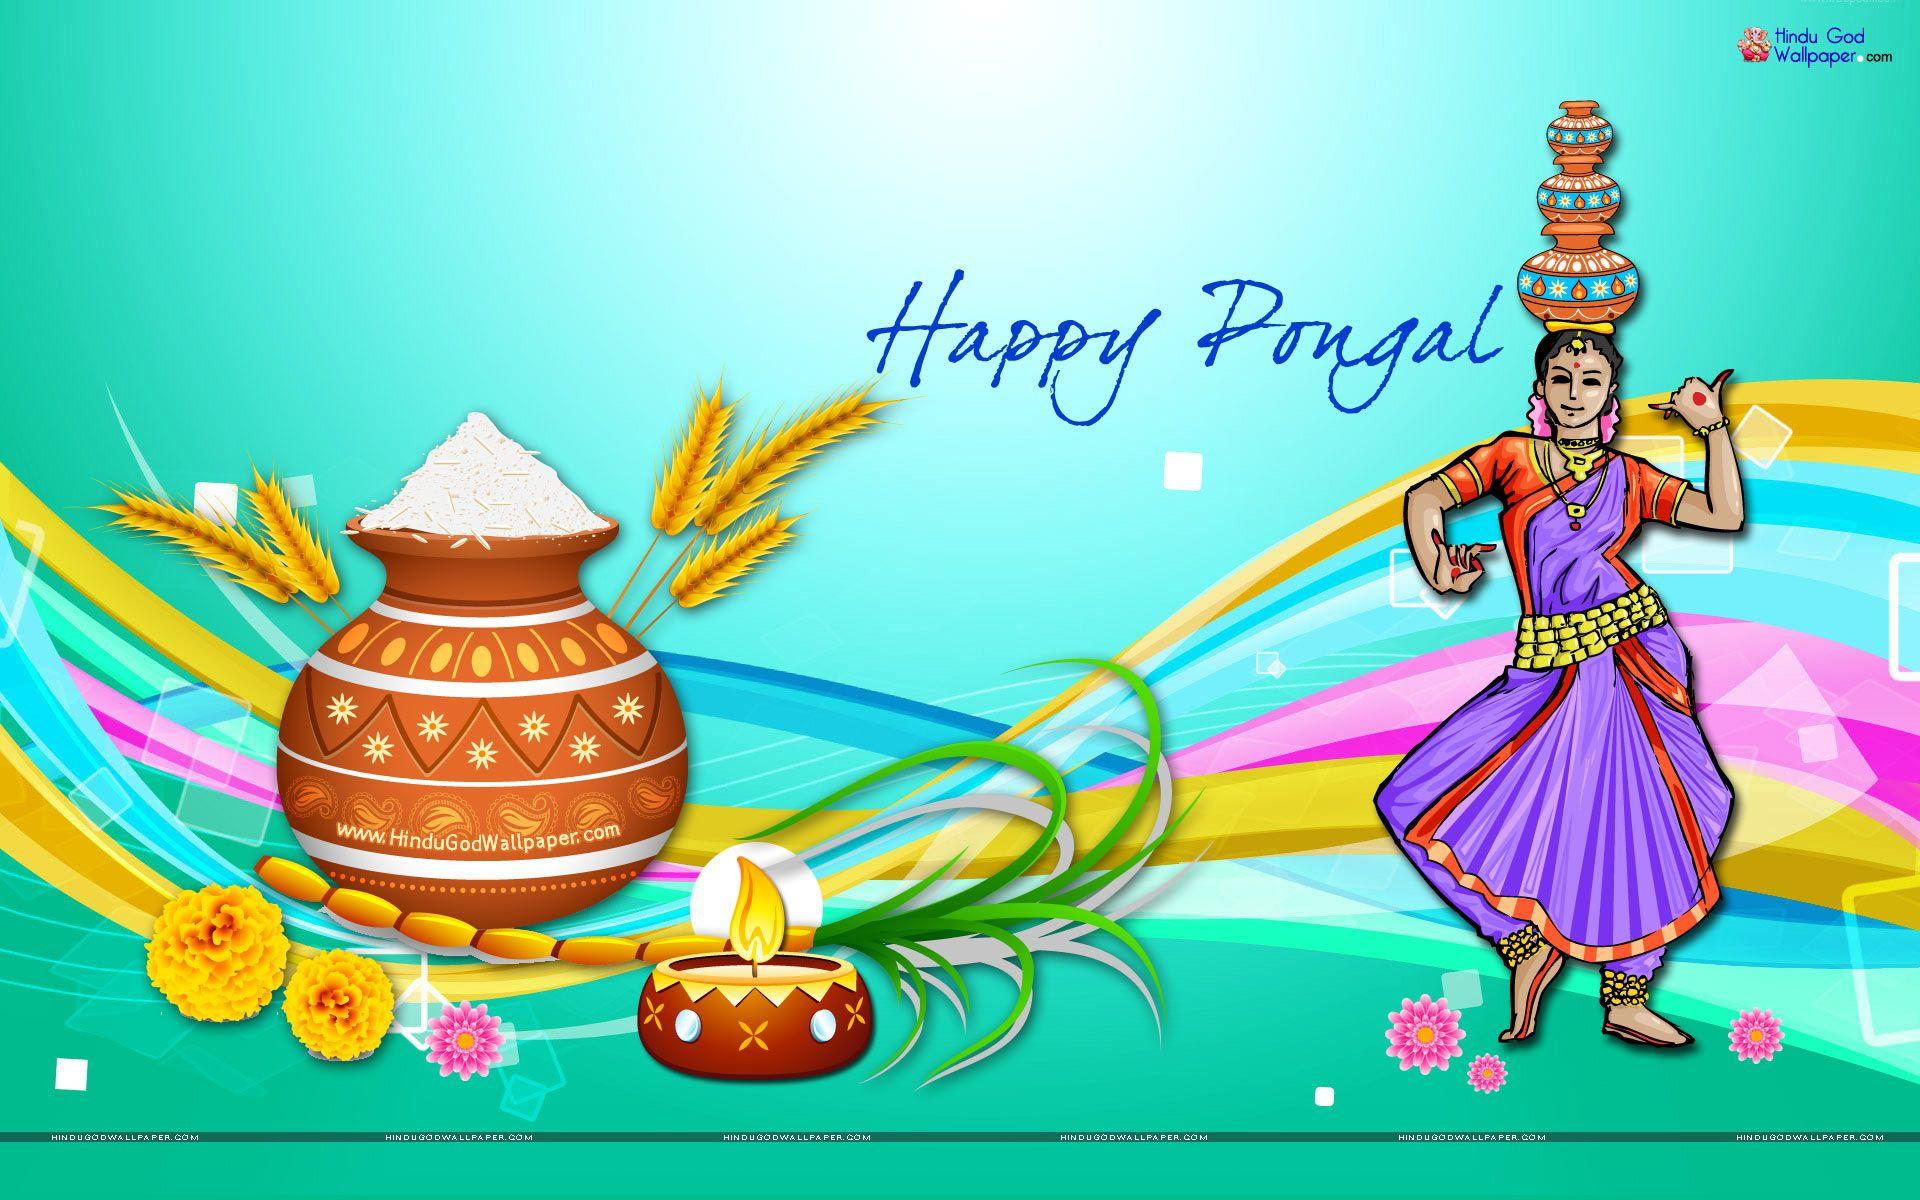 Sankranti Hd Wallpapers Happy Pongal Hd Wallpapers Full Size Free Download